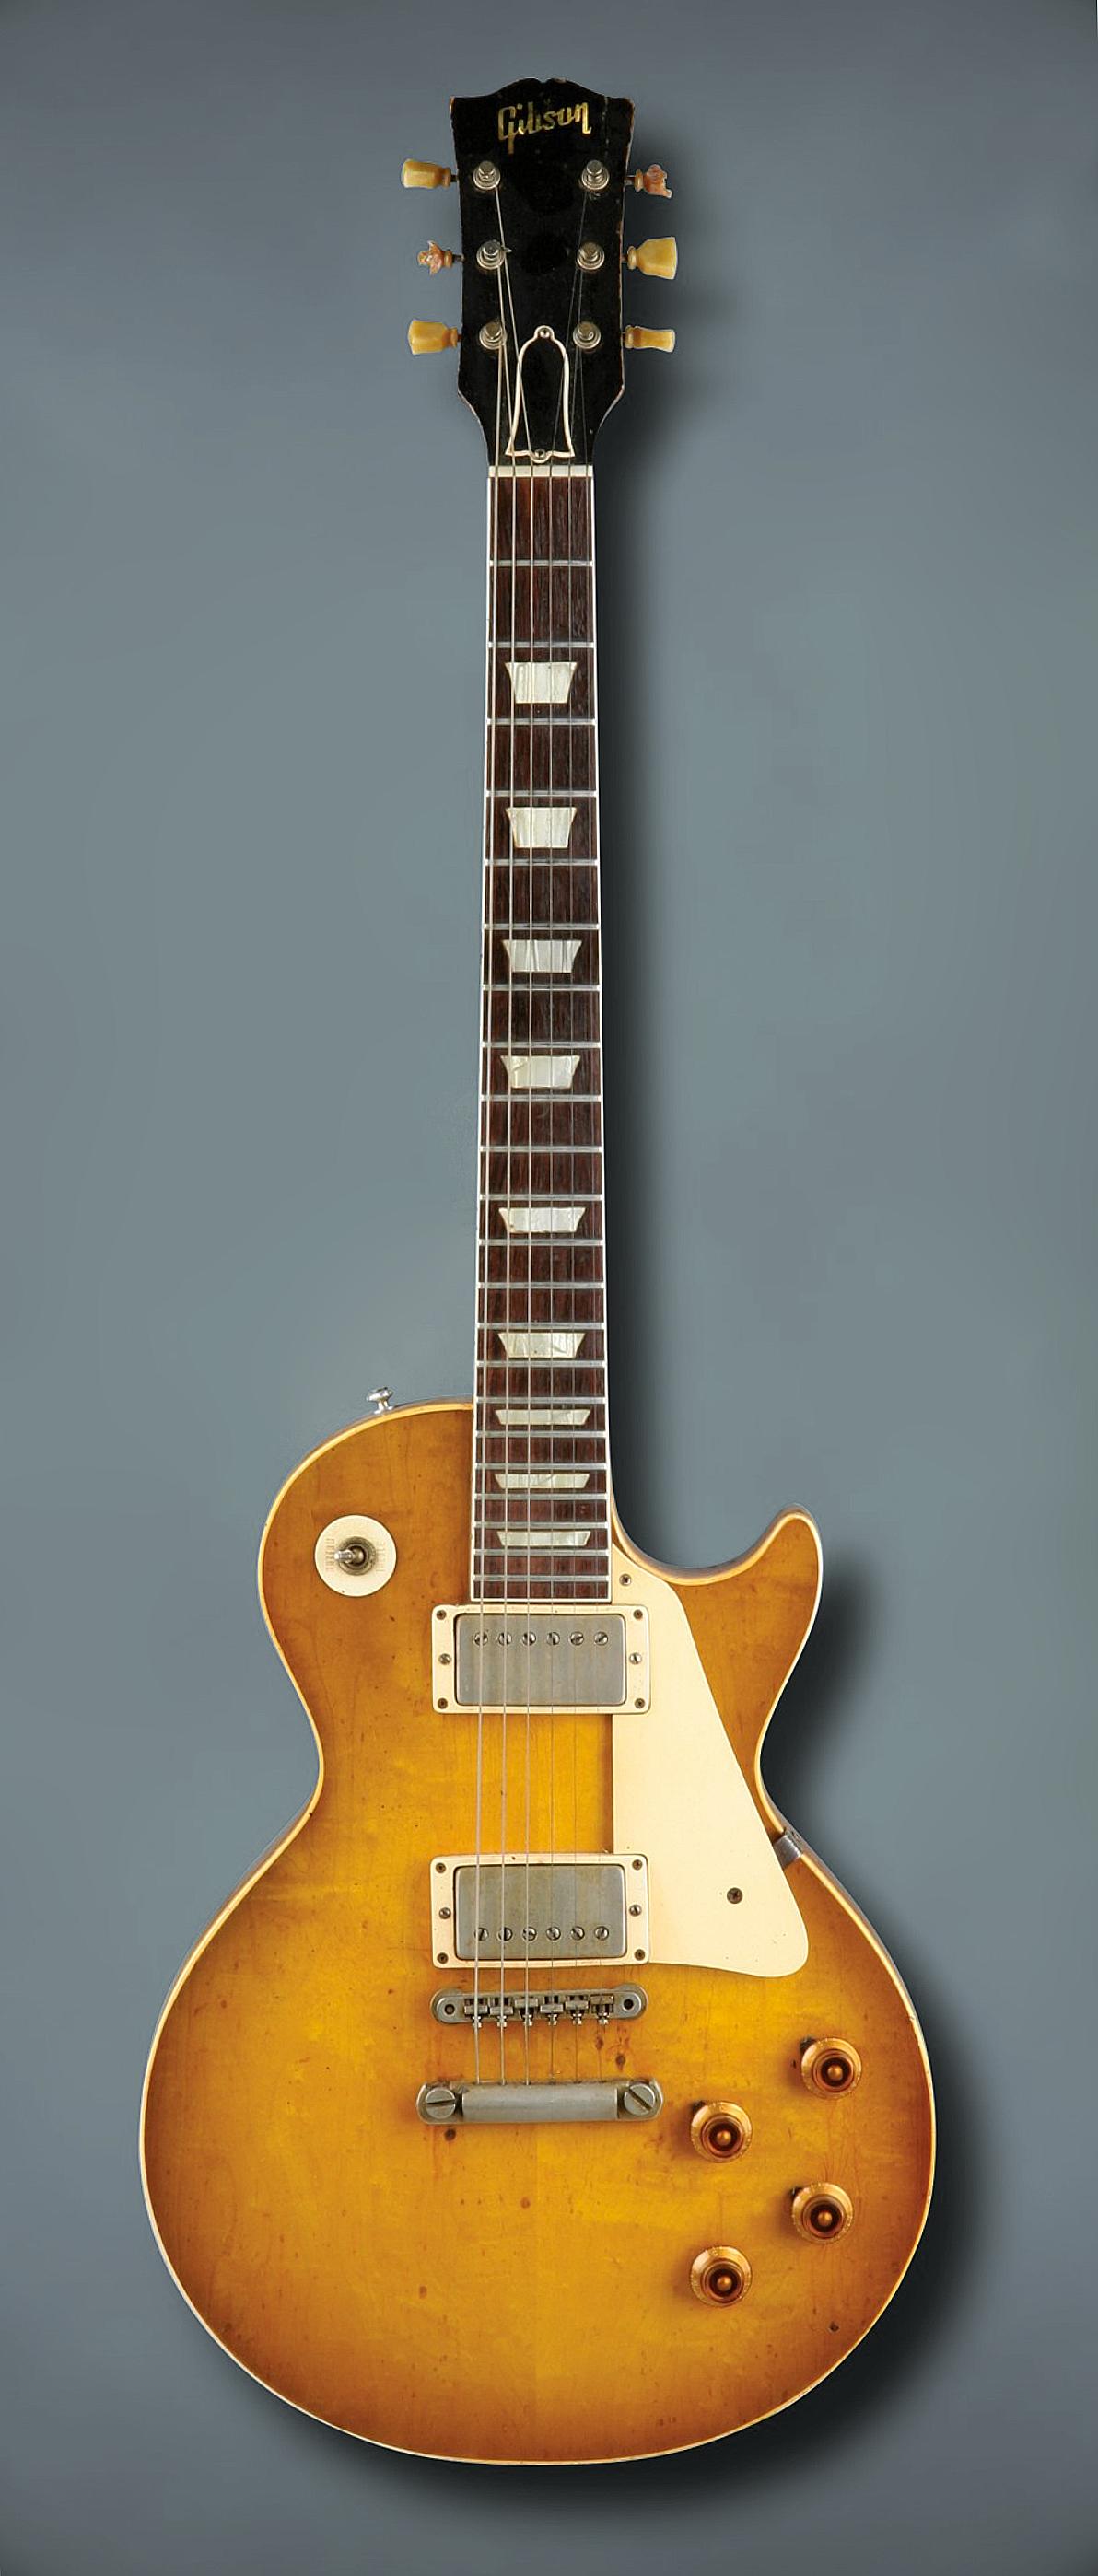 guitare electrique keith richards